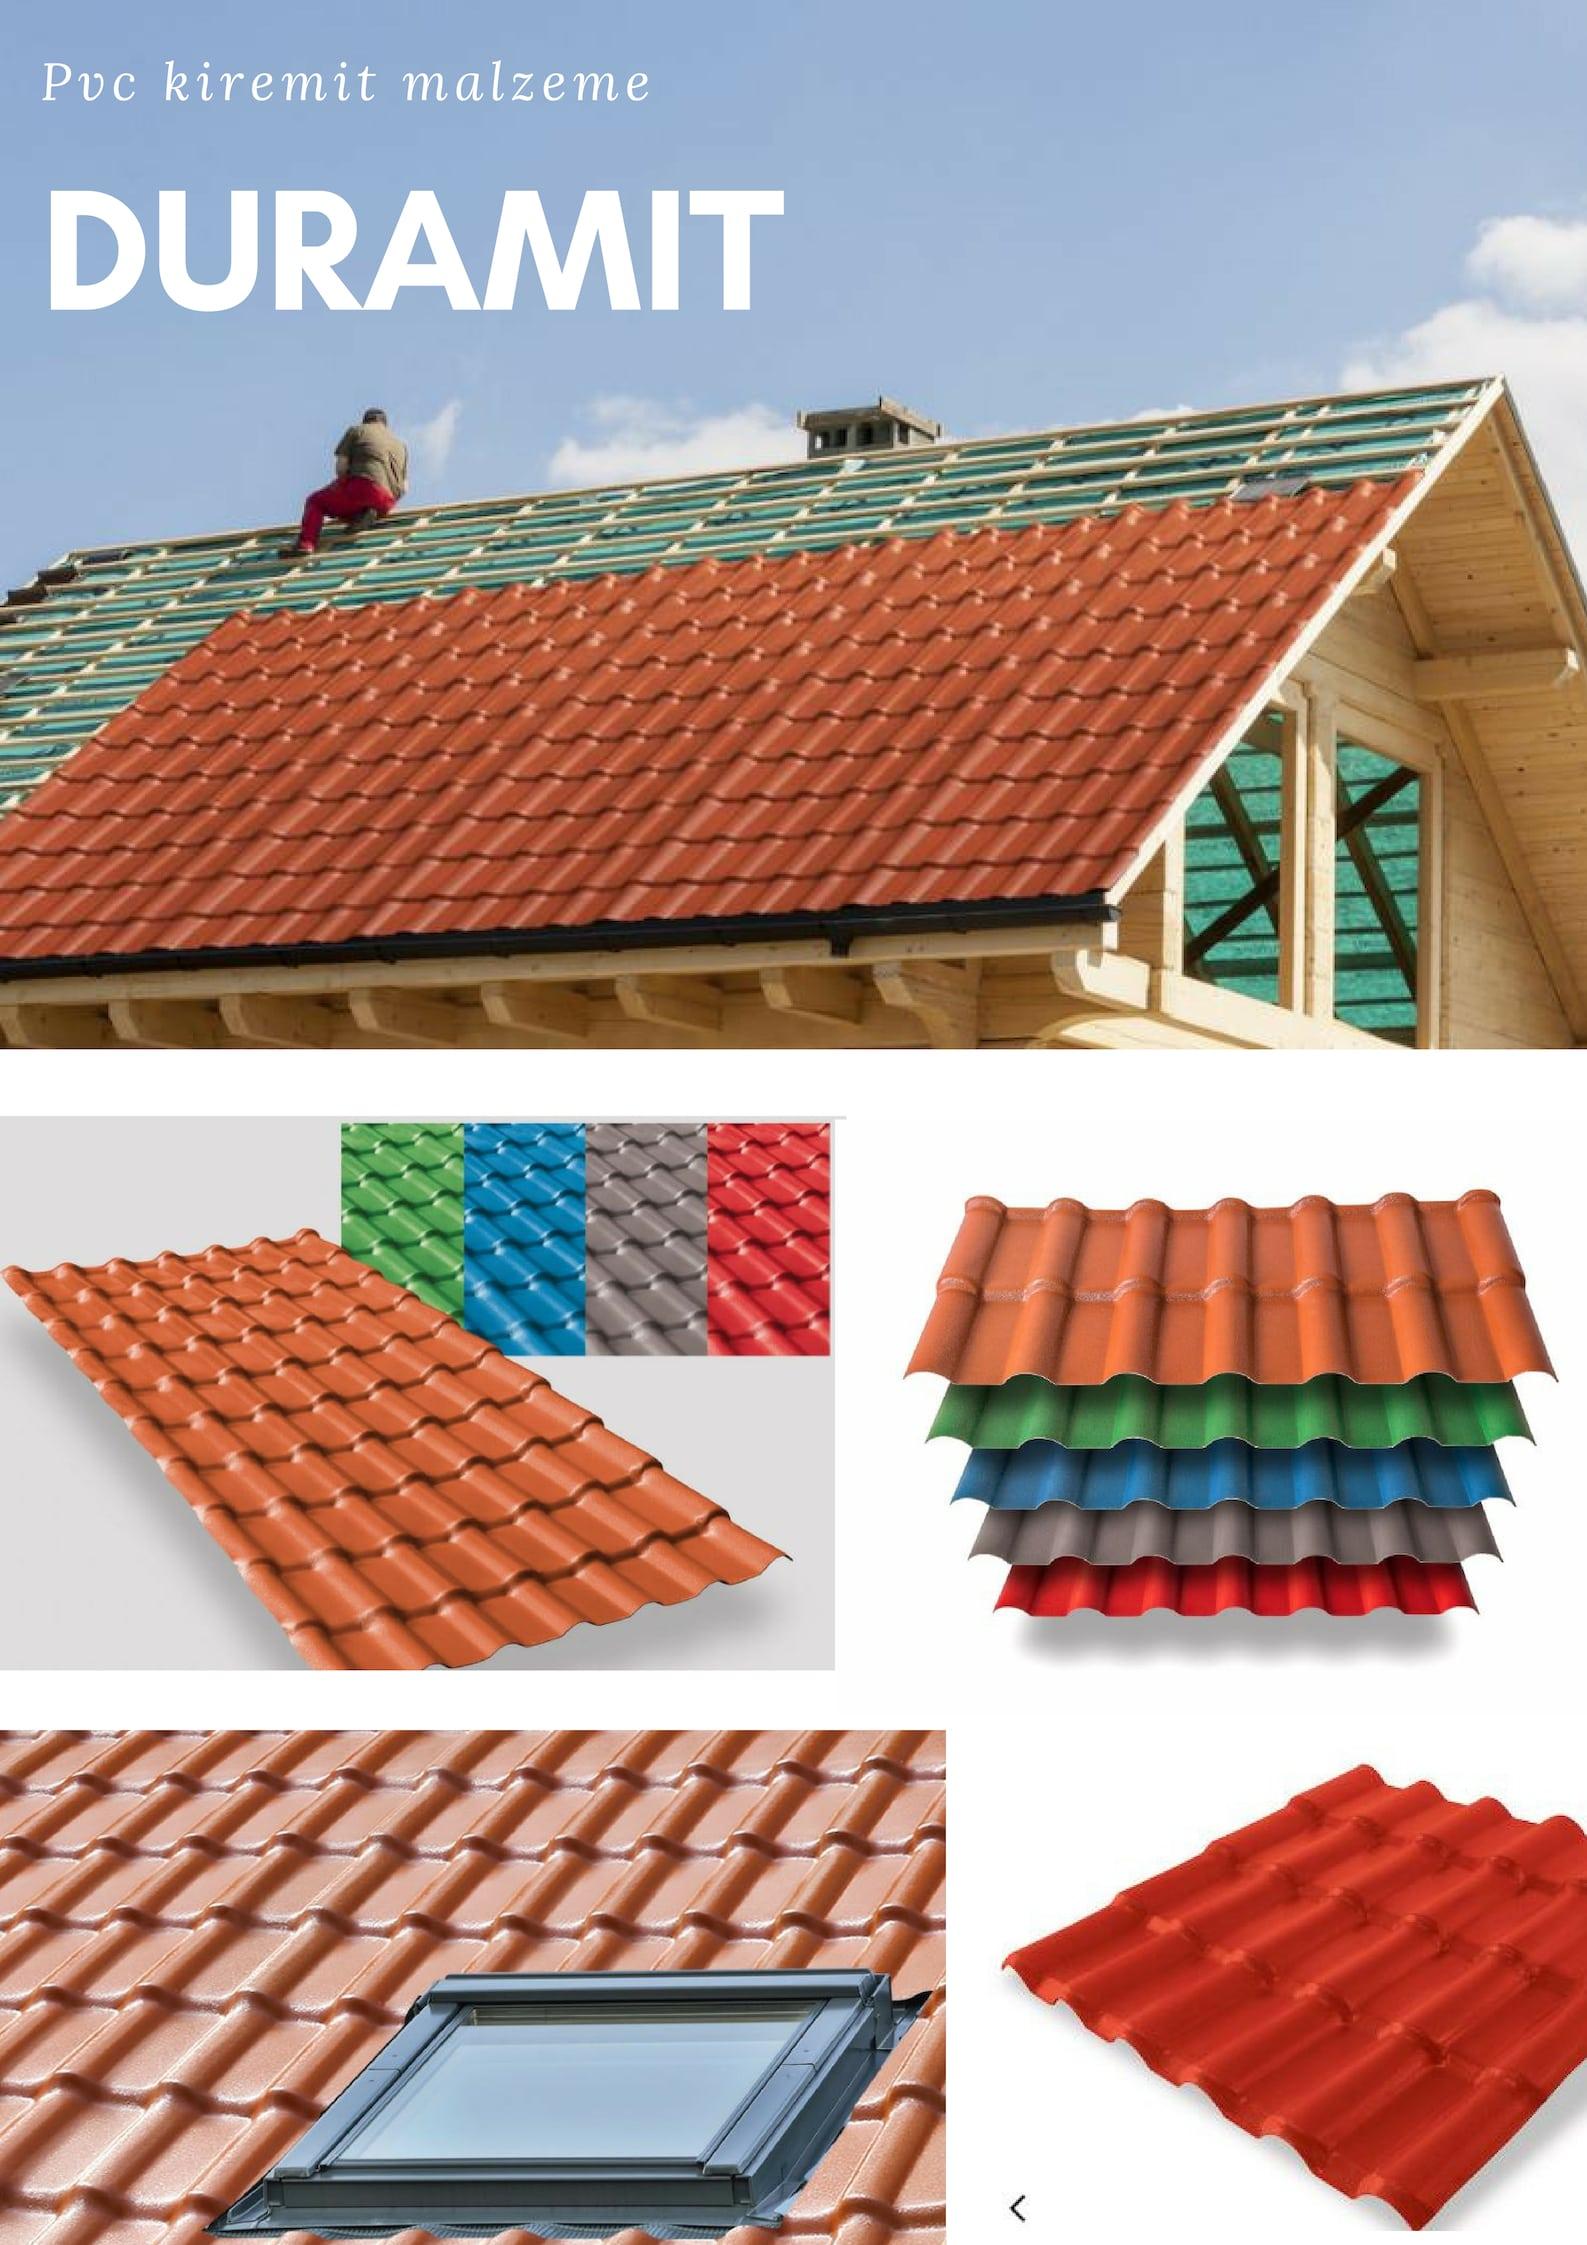 izmir çatı ürünü duramit pvc kiremit